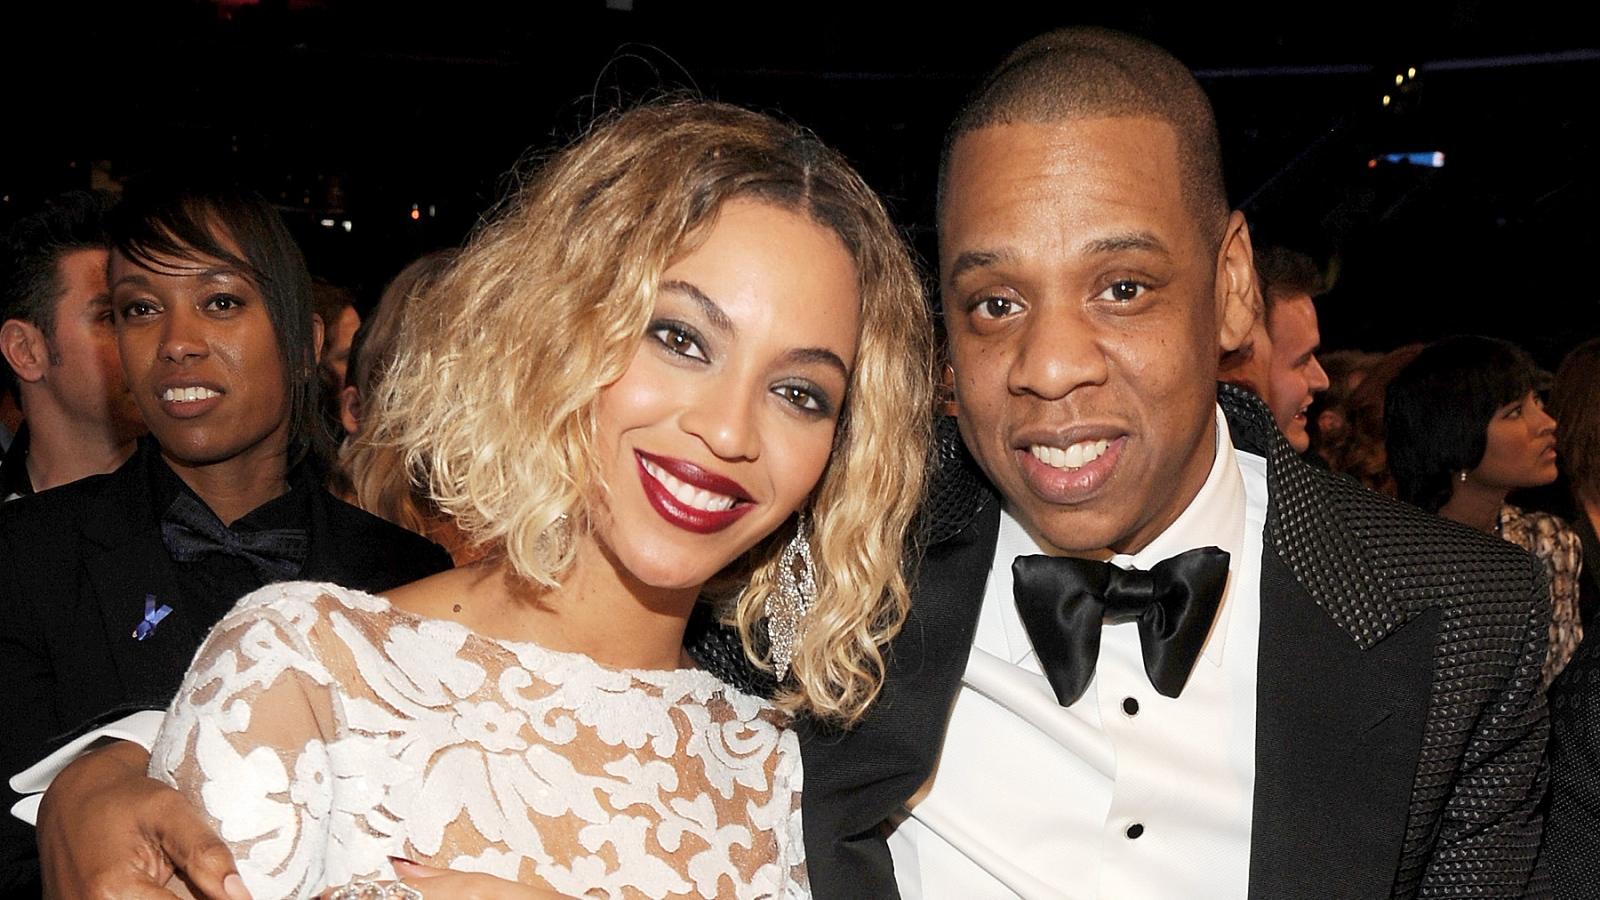 Vídeo: Jay-z admite ter traído Beyoncé